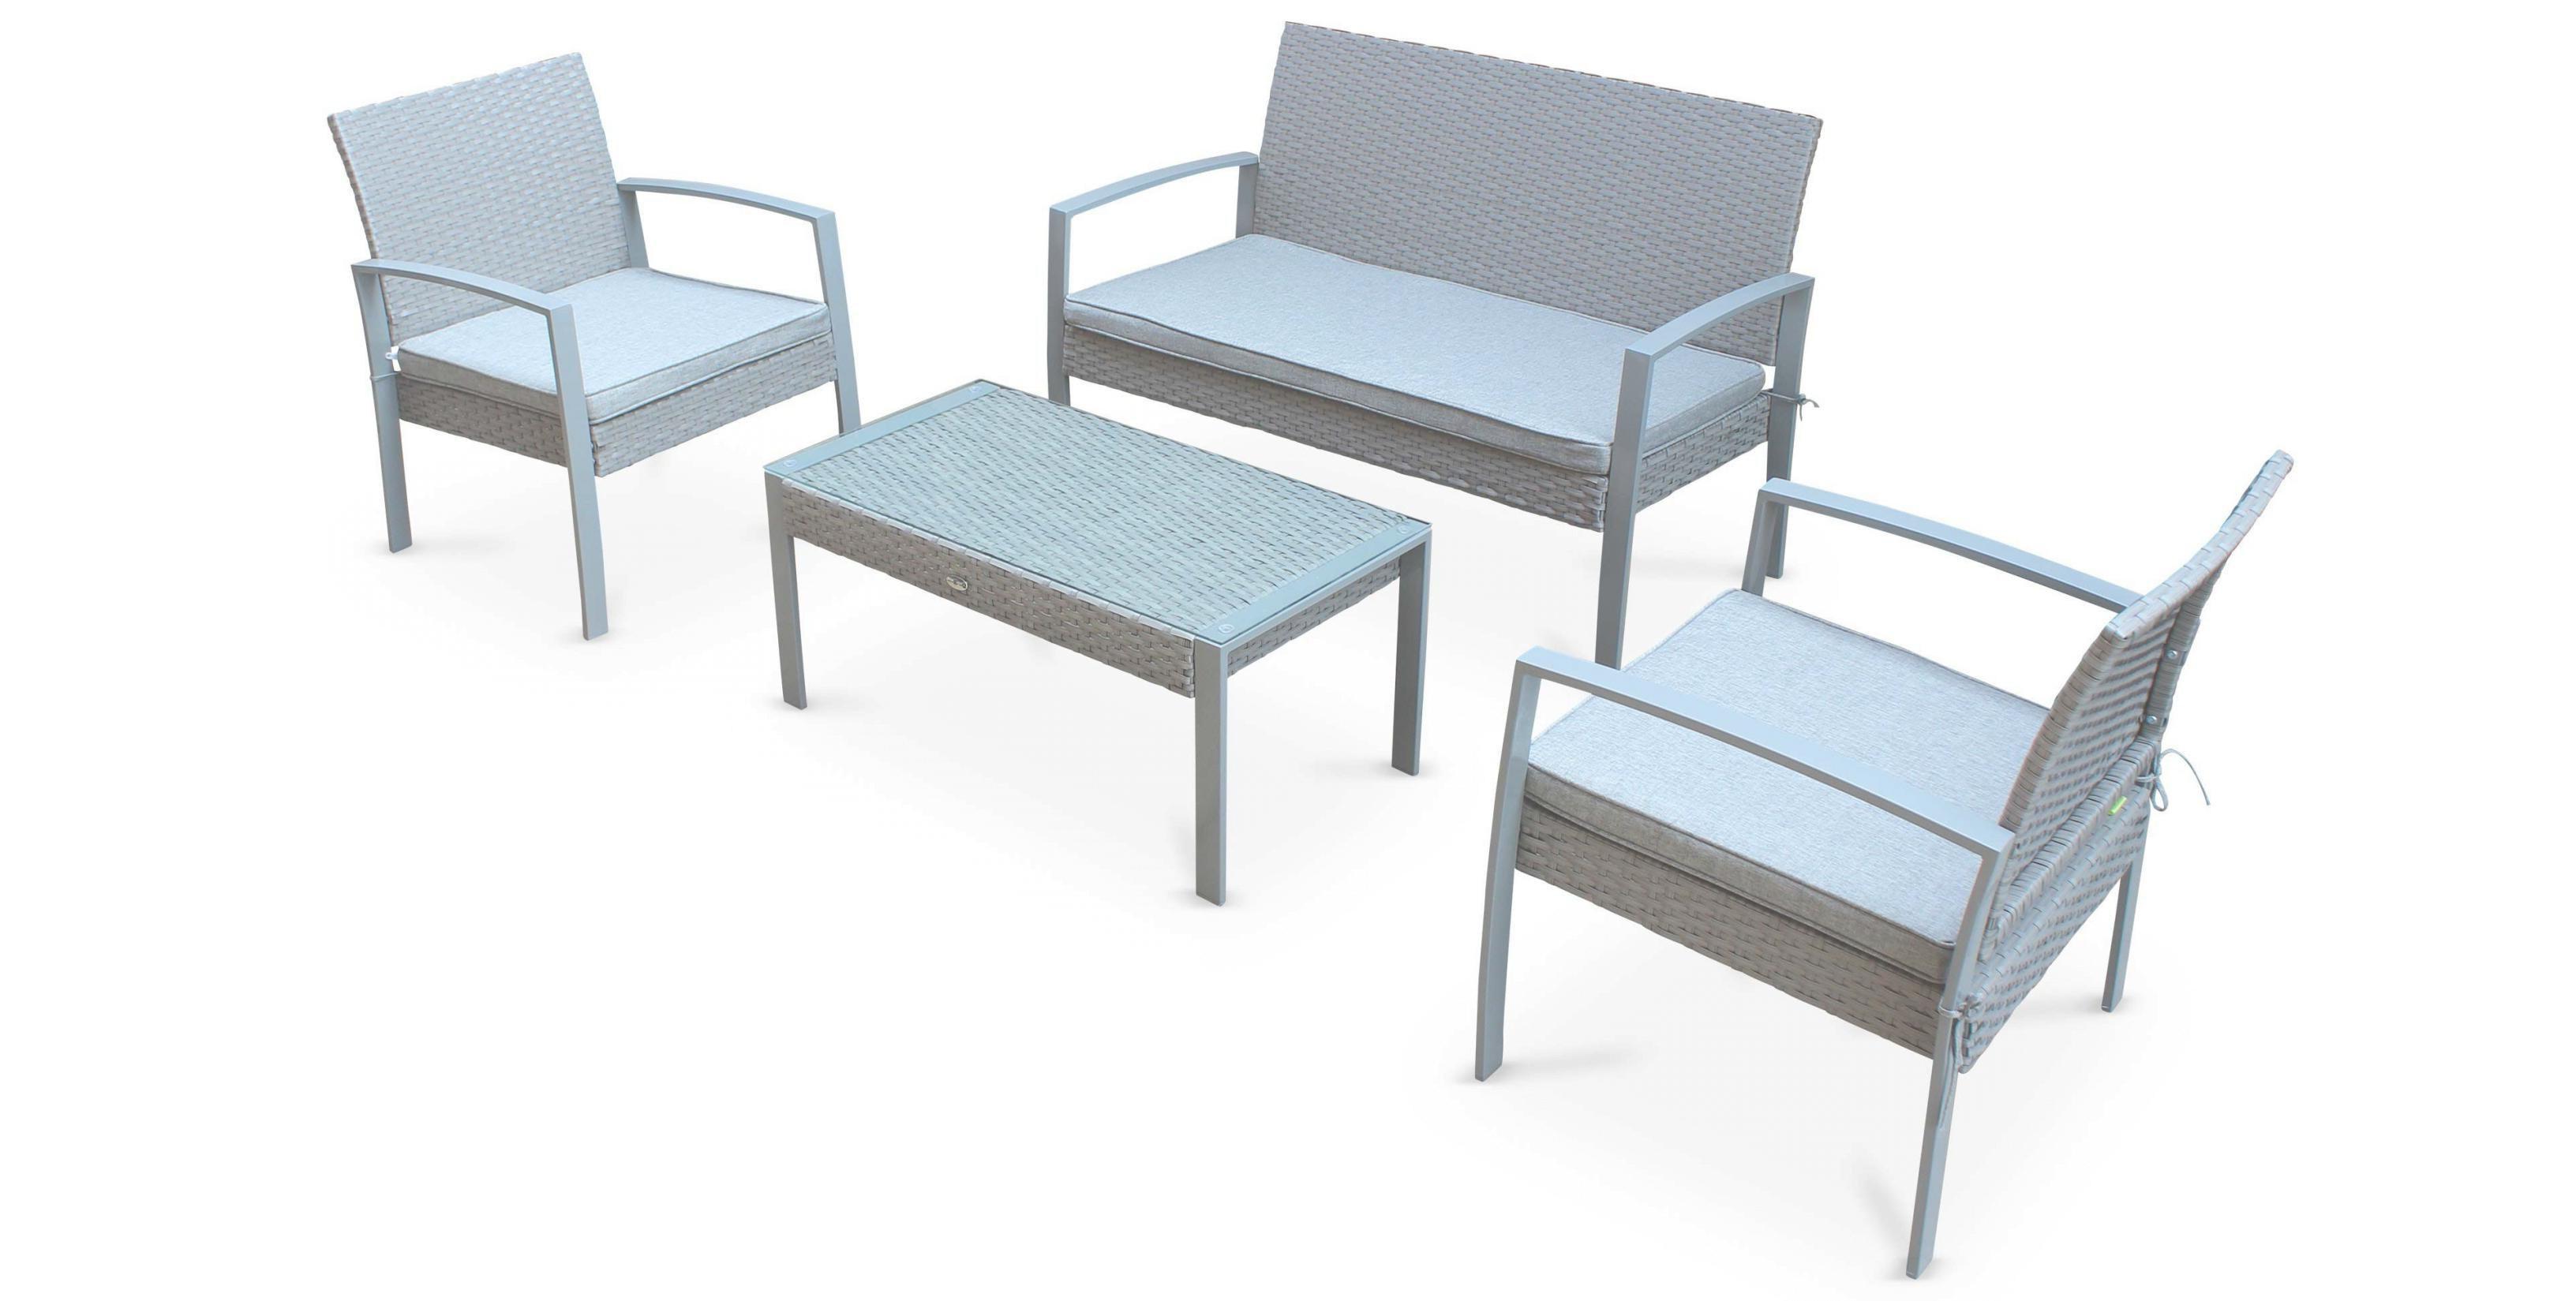 Chaise De Jardin Super U Beau Image Table De Jardin Chaises Cool Mobilier De Jardin Chaise Metal Table